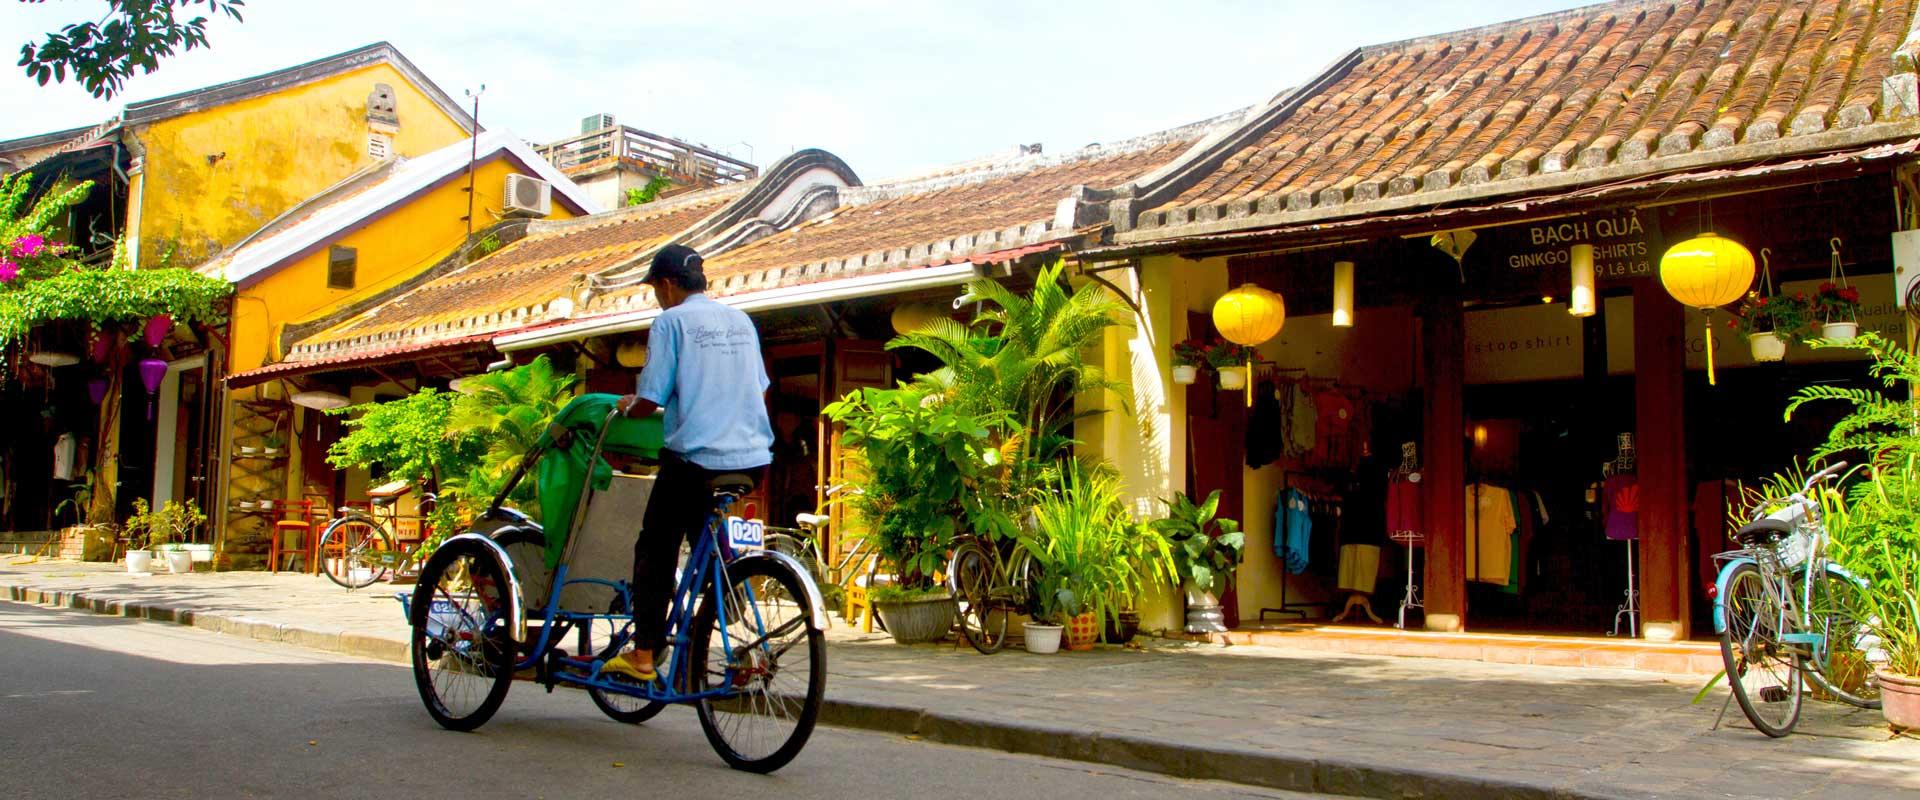 Hoi An maisons jaunes Vietnam